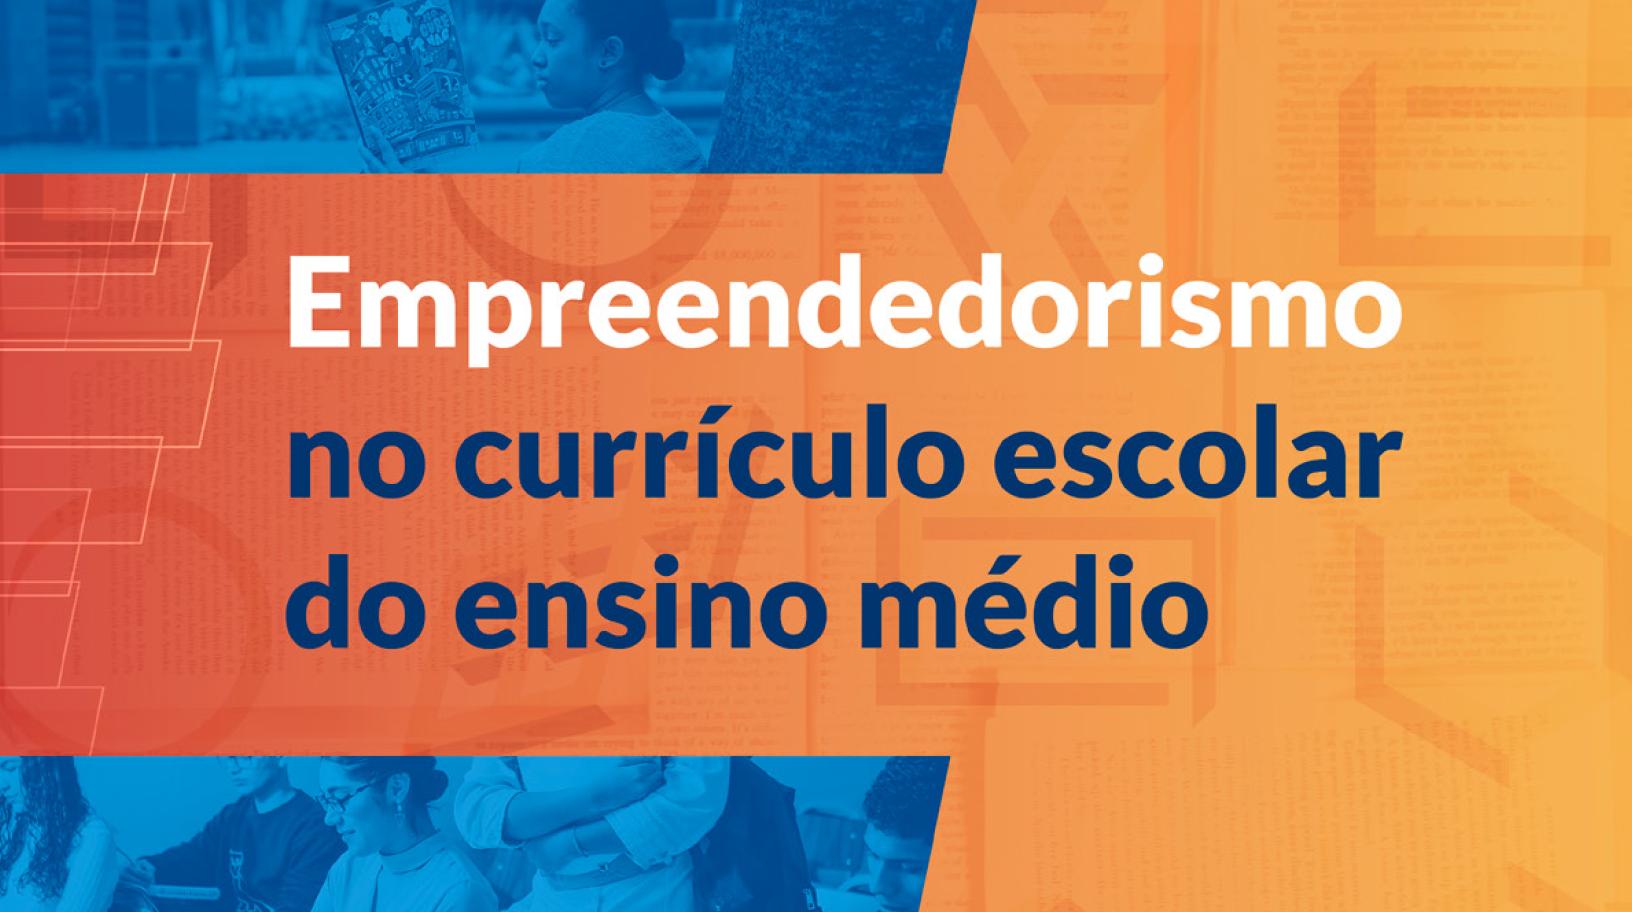 Empreendedorismo no Currículo Escolar do Ensino Médio